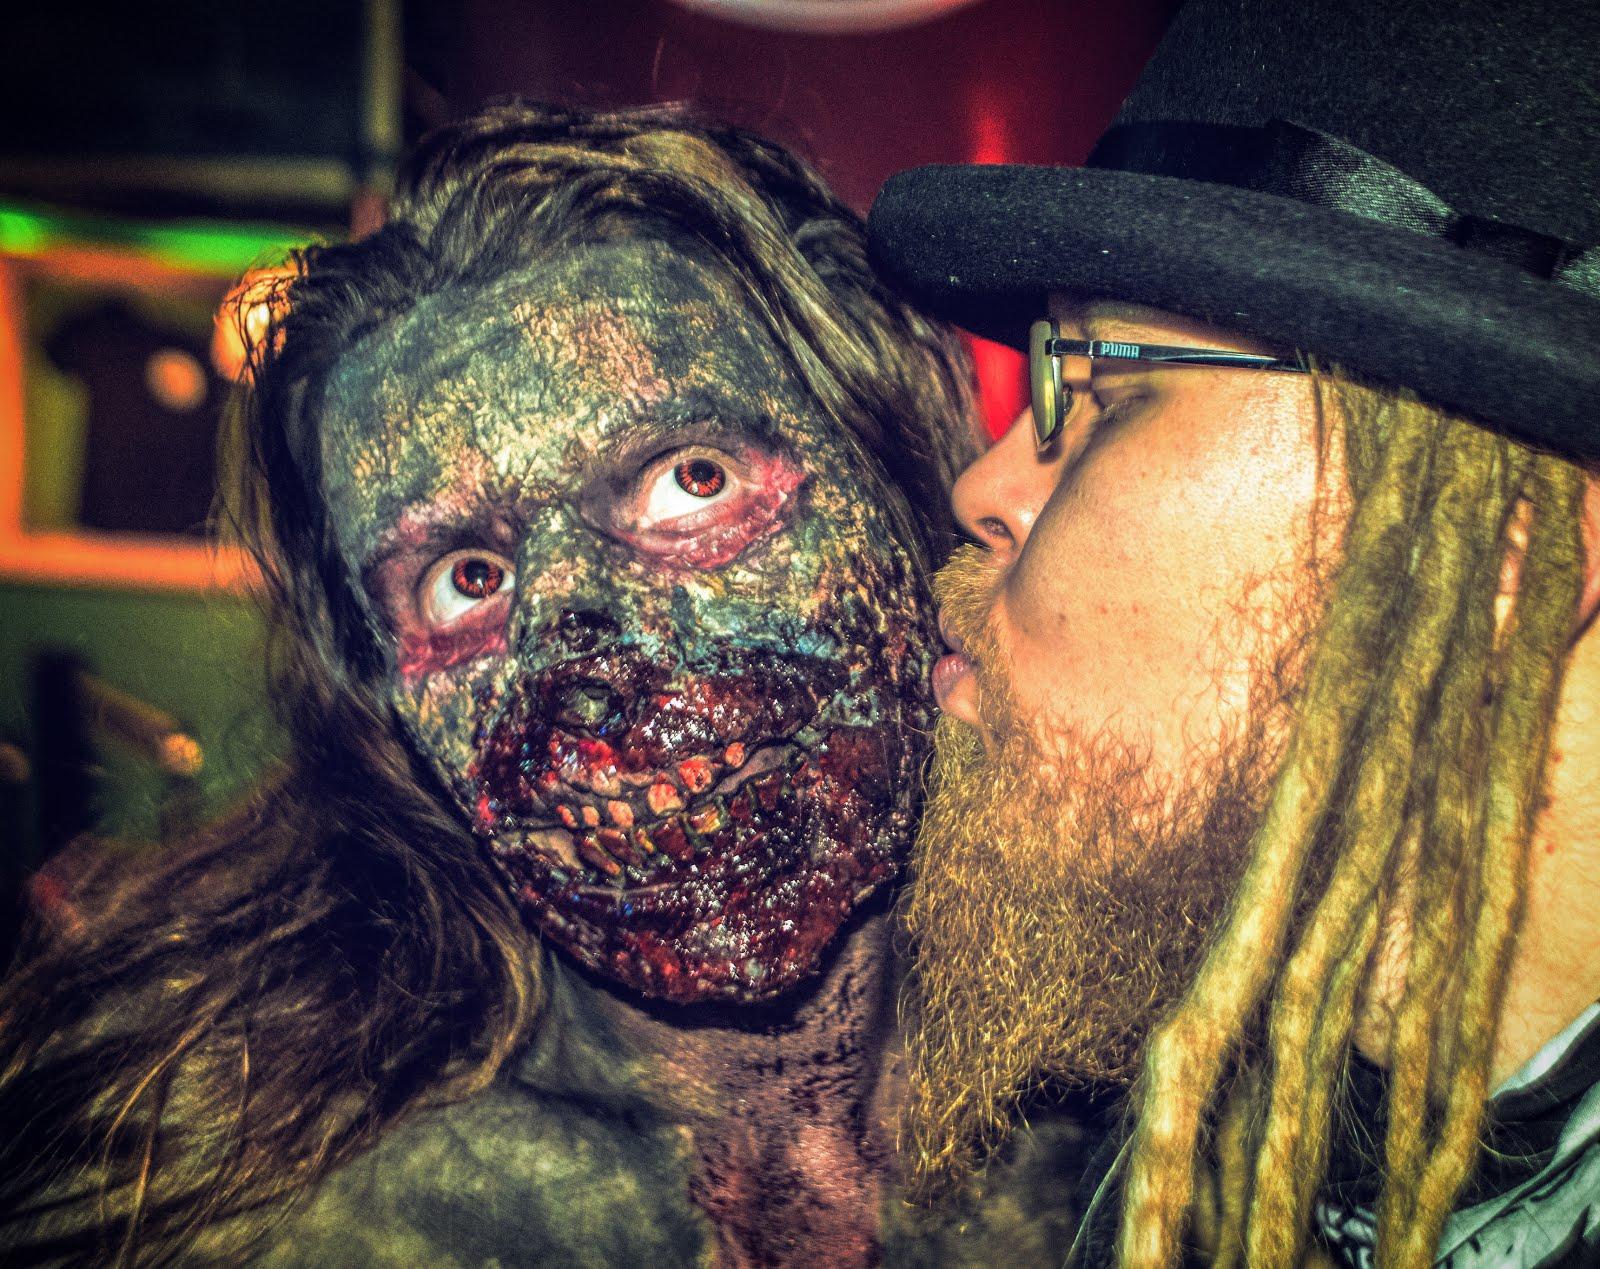 Zombie. 2016. Halloween tehostemaskeeraus: Ari Savonen.